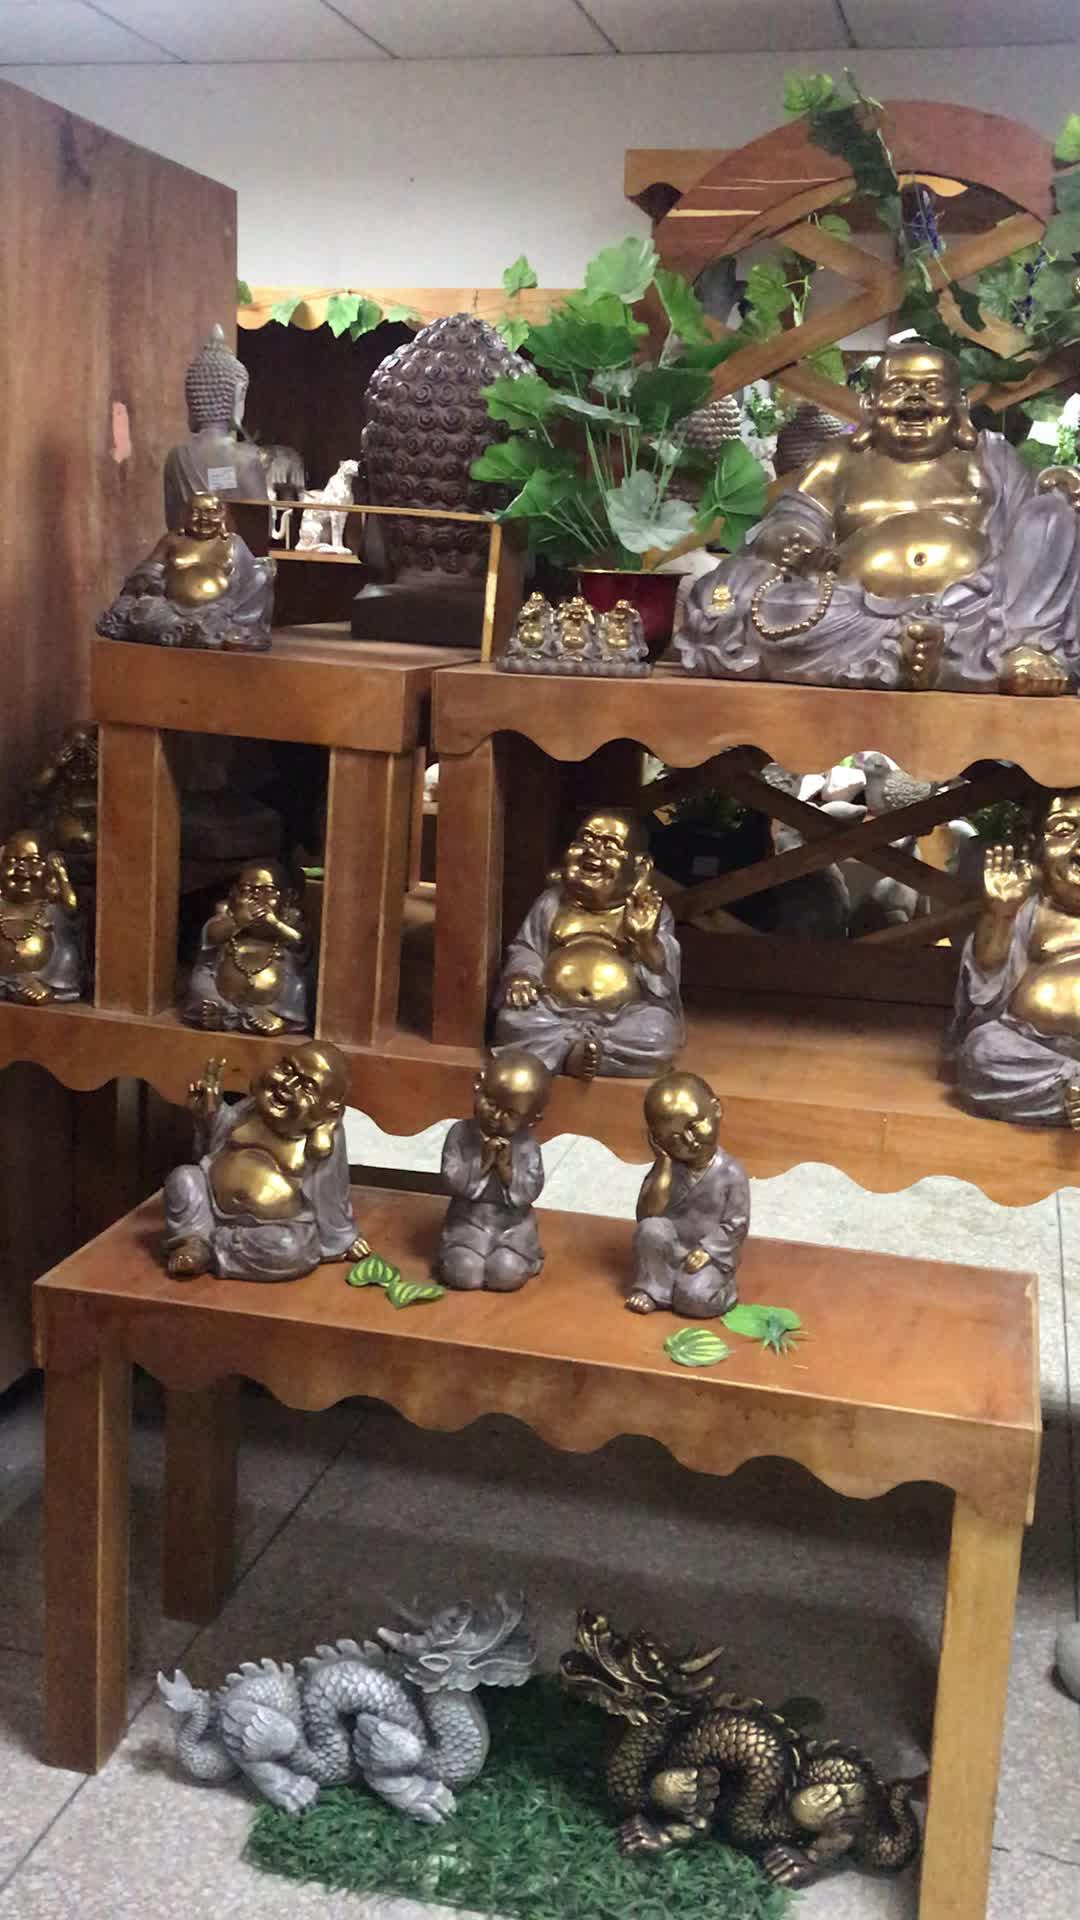 Religious design garden decor ornament buddha sculpture for sale